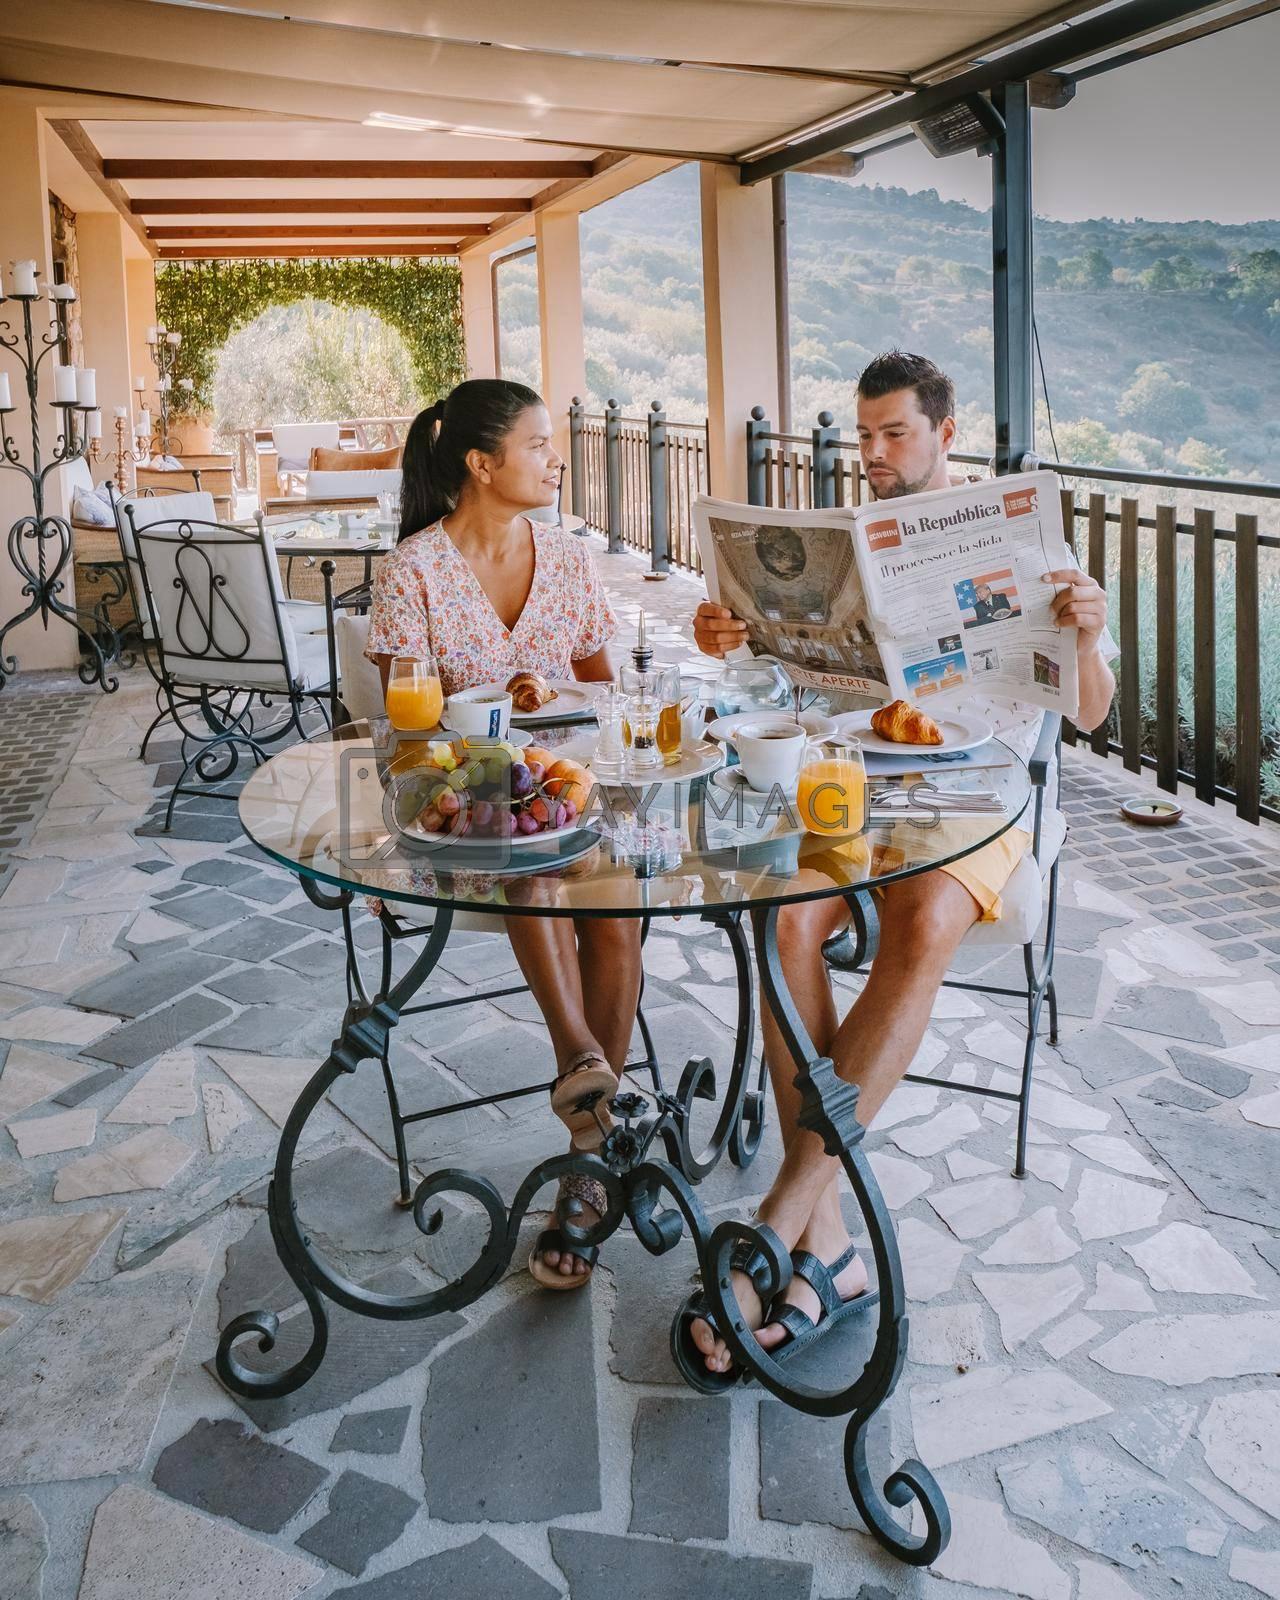 couple having breakfast at luxury villa at the Italian country side near Rome Italy.